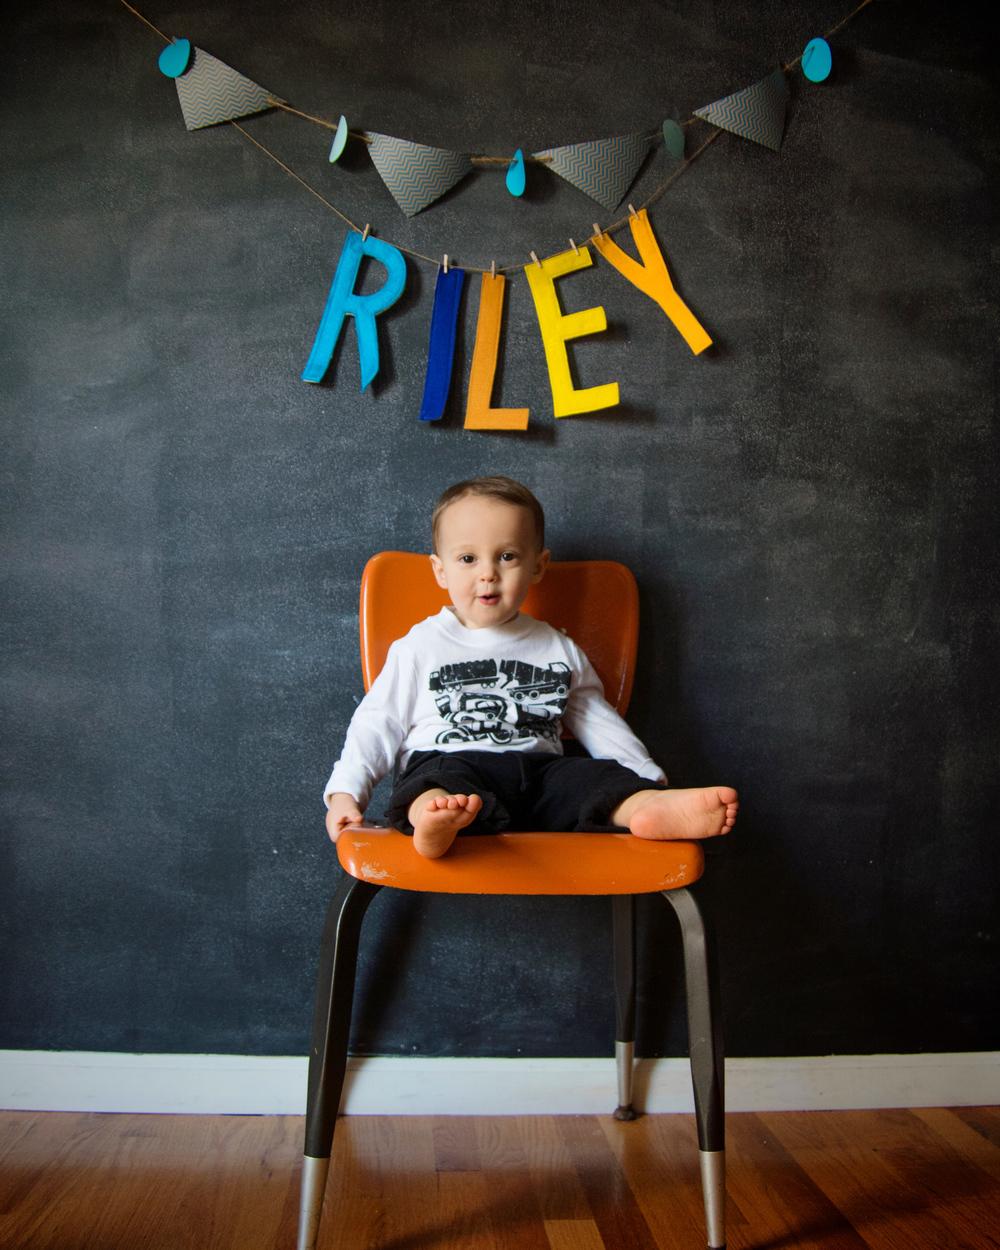 riley122.jpg